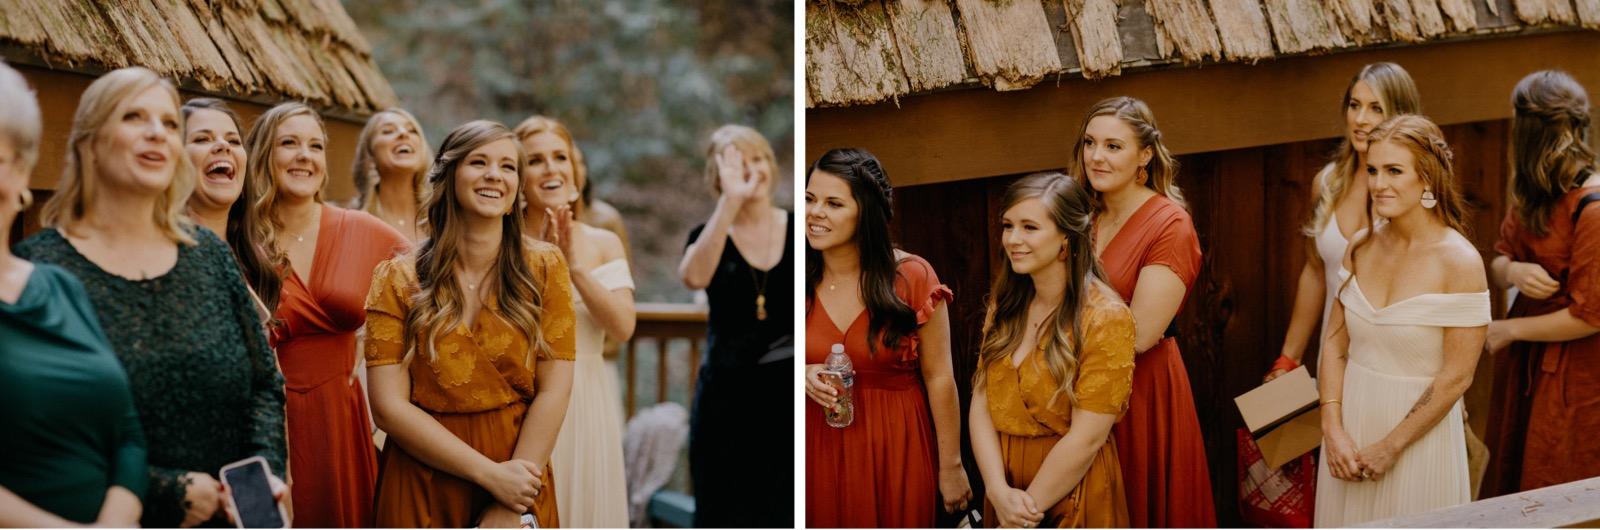 029_Emily & Jeff Wedding 0217_Emily & Jeff Wedding 0215_forest_bride_outdoor_first-look_moments_groom_wedding